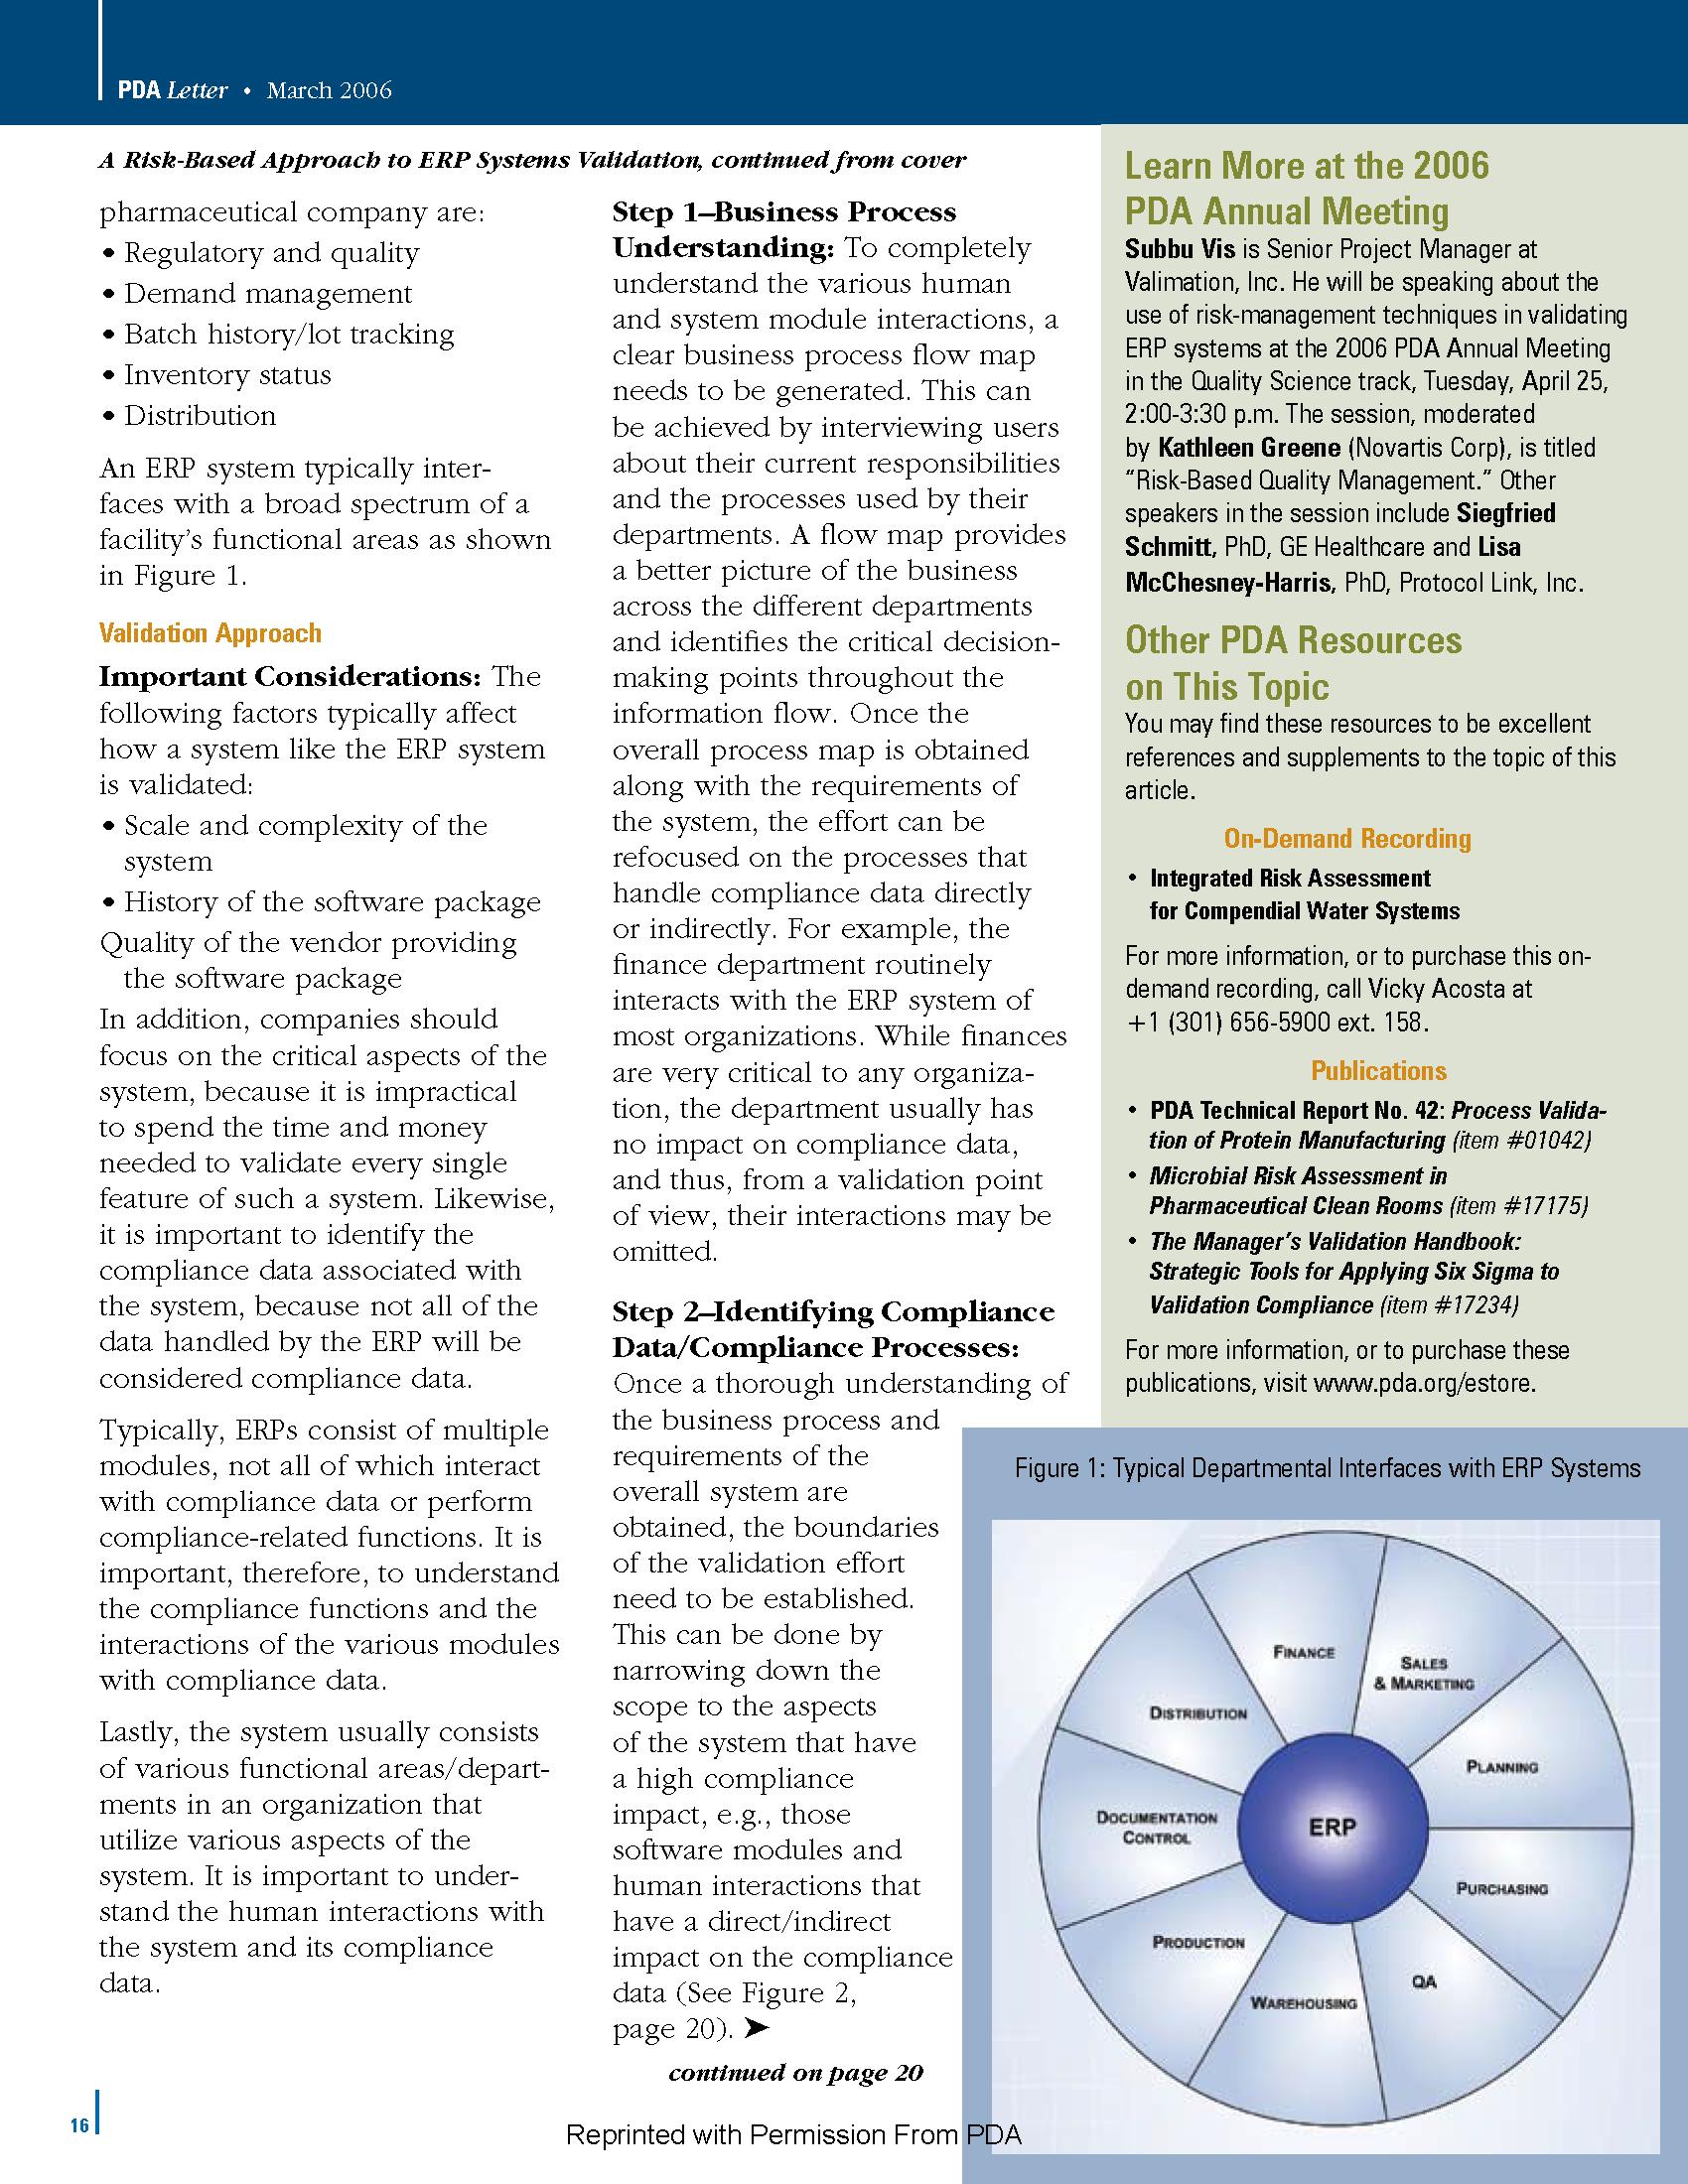 PDA Letter - ValiMation - ERP Validation - Risk Management Article_Page_2.png